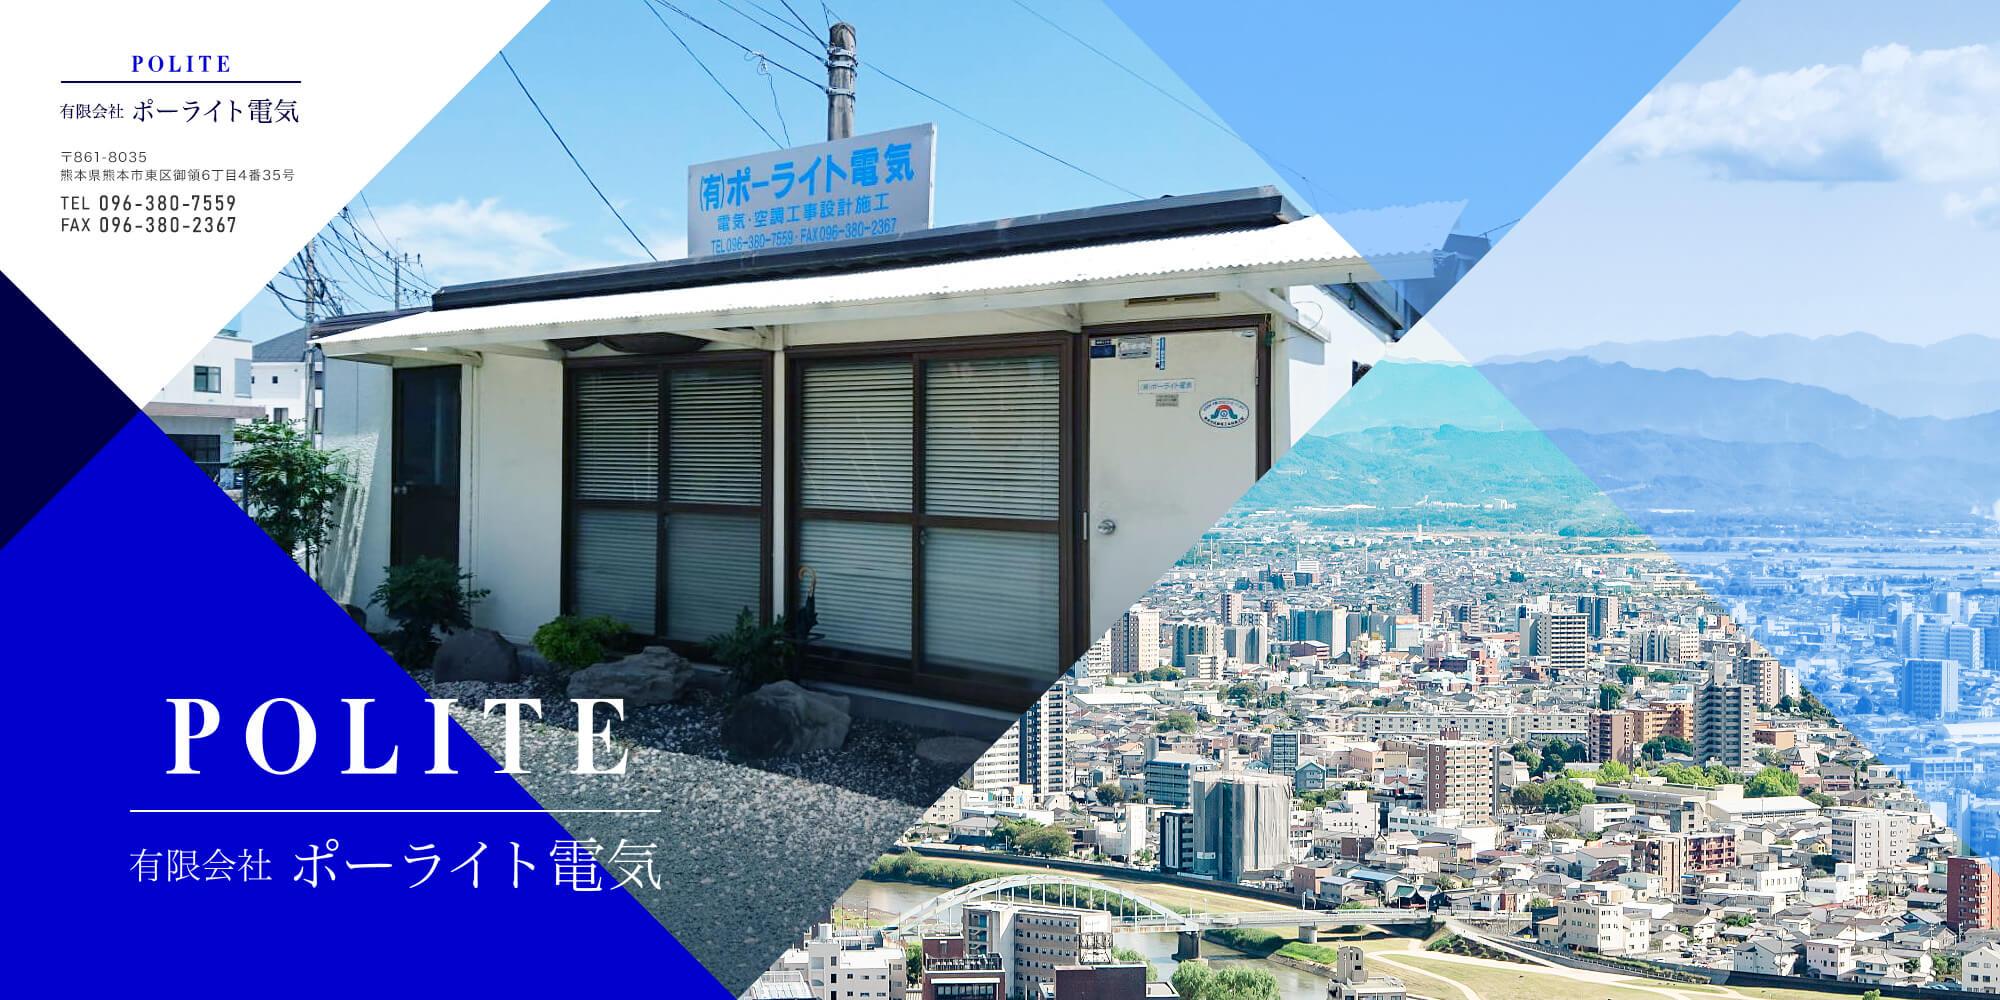 有限会社ポーライト電気 熊本県熊本市東区御領6-4-35 TEL:096-380-7559 FAX:096-380-2367